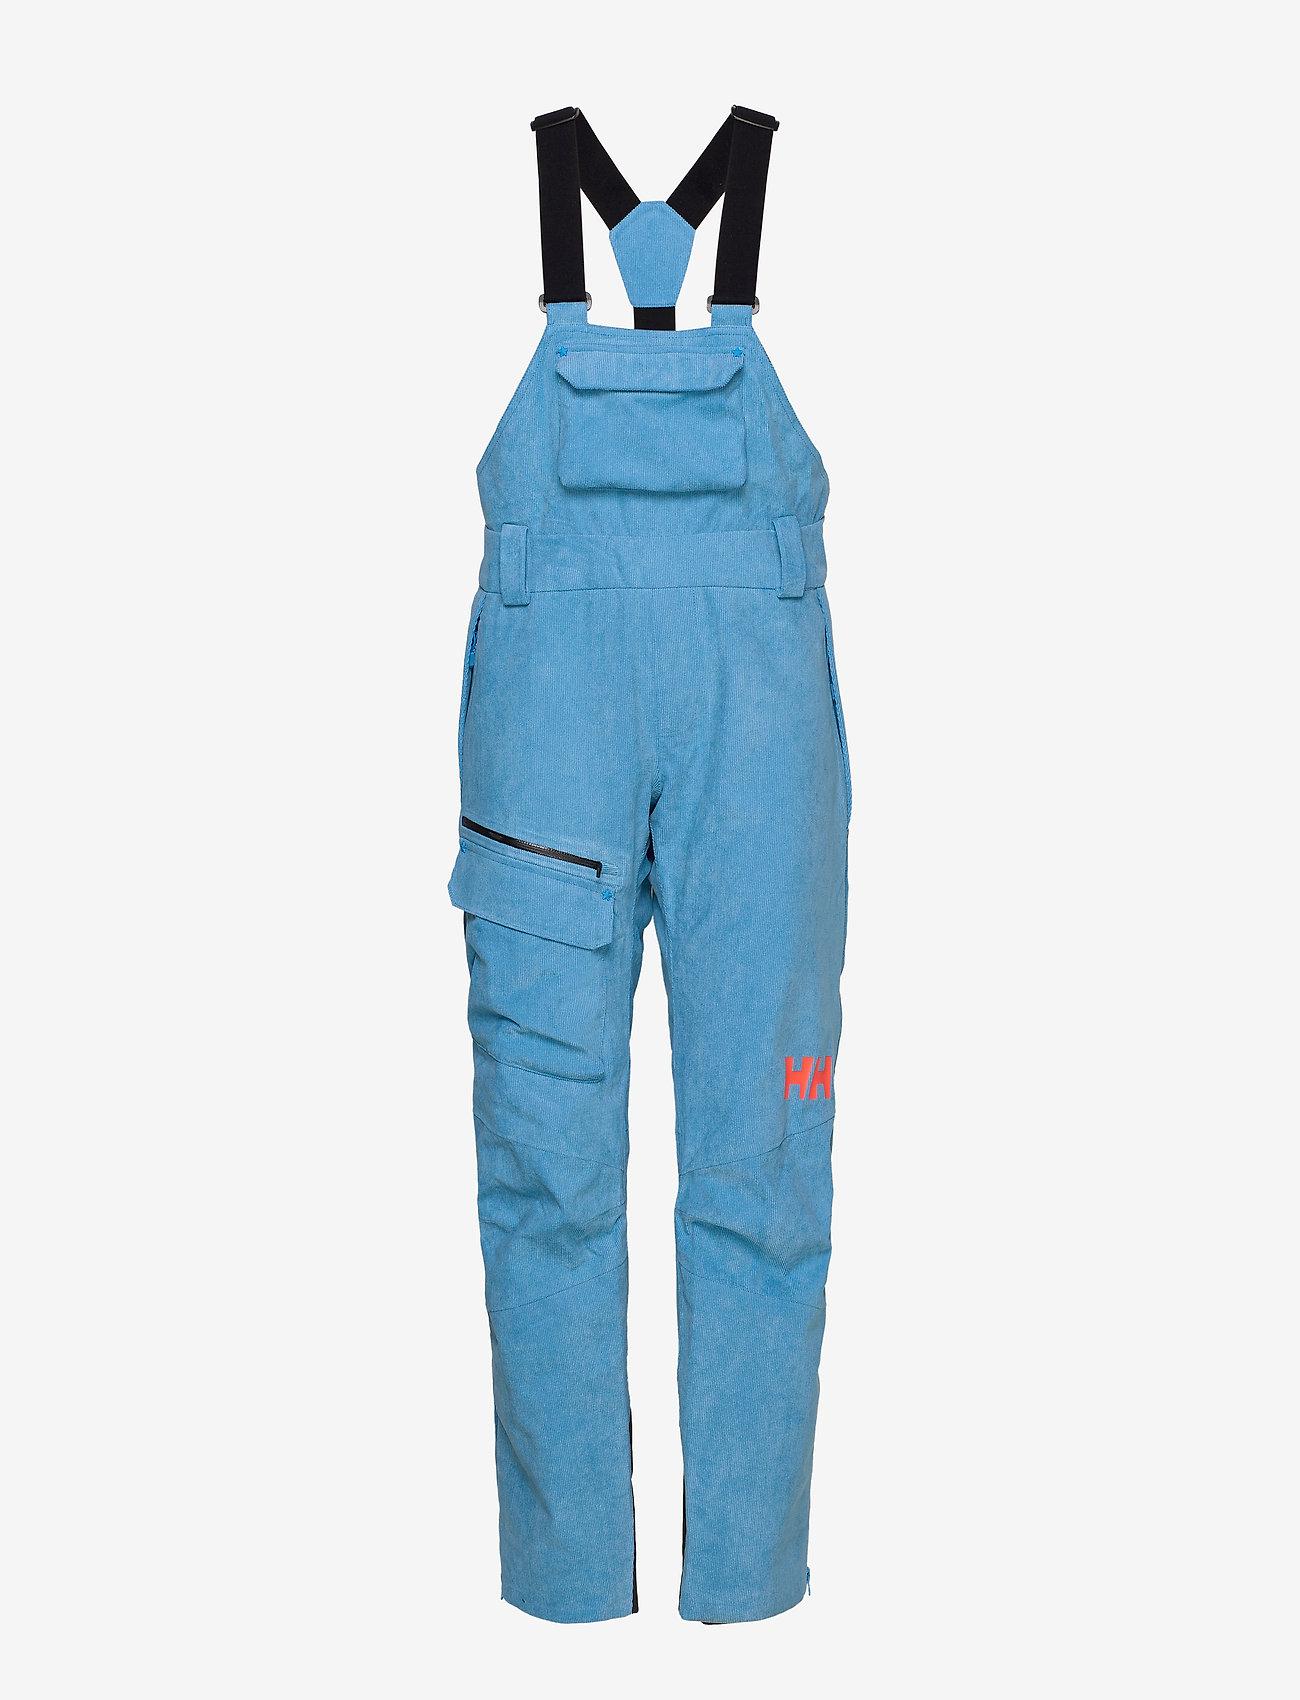 Helly Hansen - W POWDERQUEEN BIB PANT - shell pants - bluebell - 1